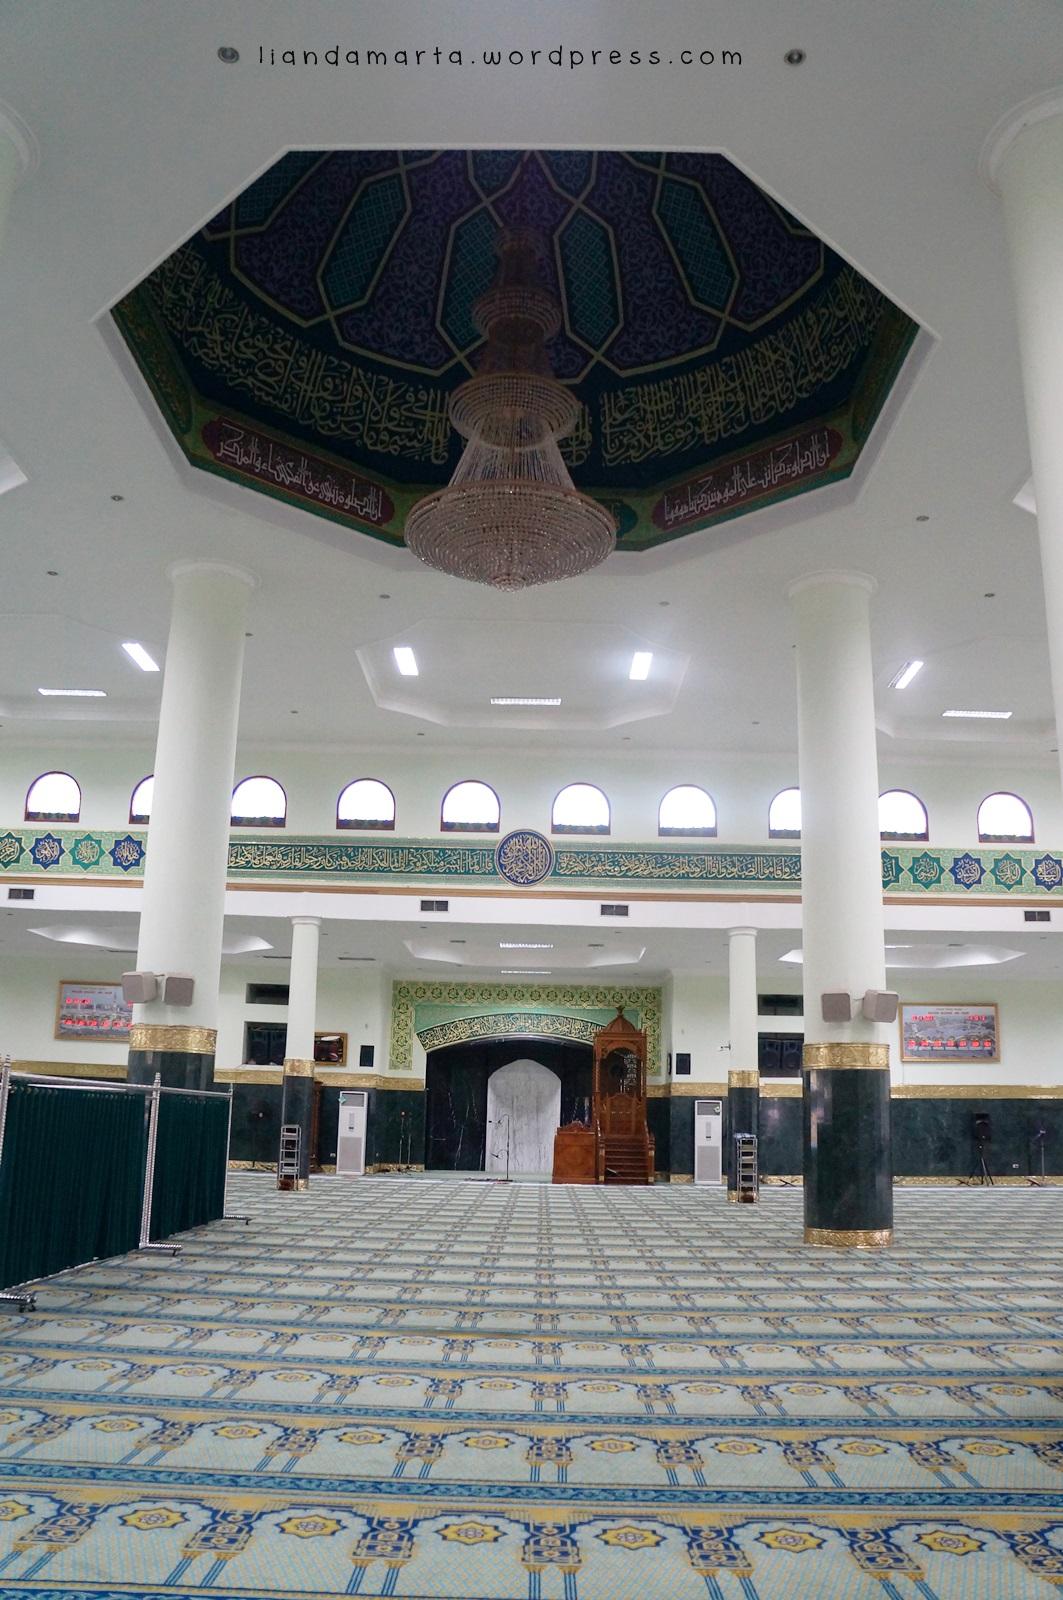 Masjid Berdesain Indah Pekanbaru Liandamarta Satu Hal Menurut Perlu Perbaikan